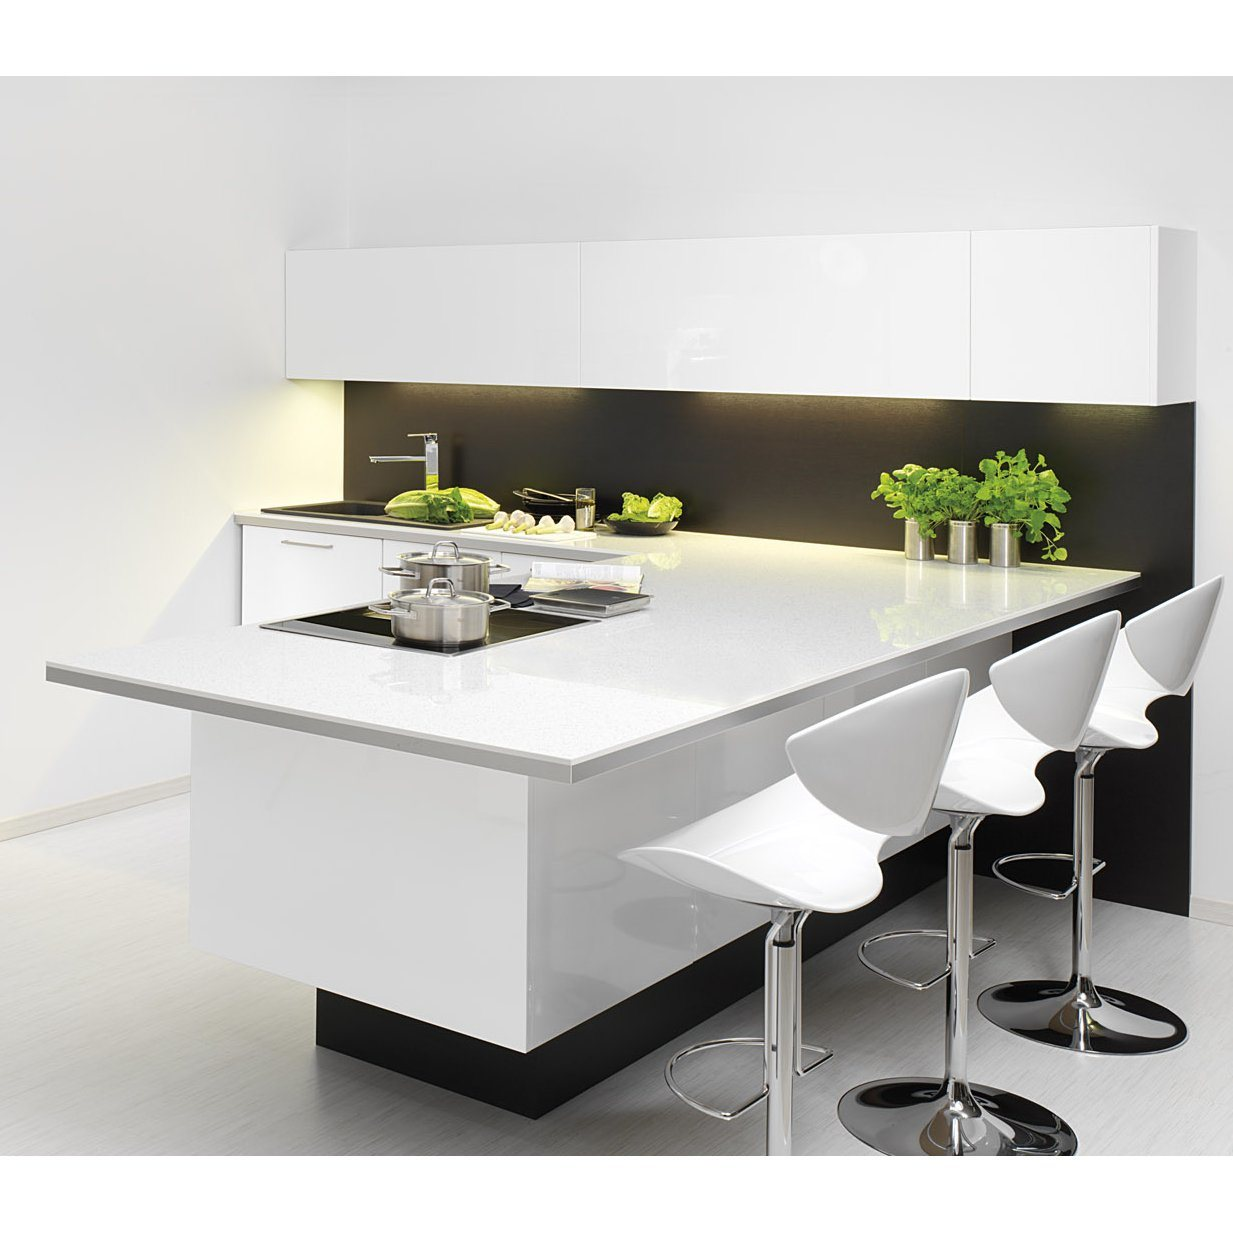 China factory custom l shaped modular different modern kitchen designs china kitchen cabinet kitchen furniture